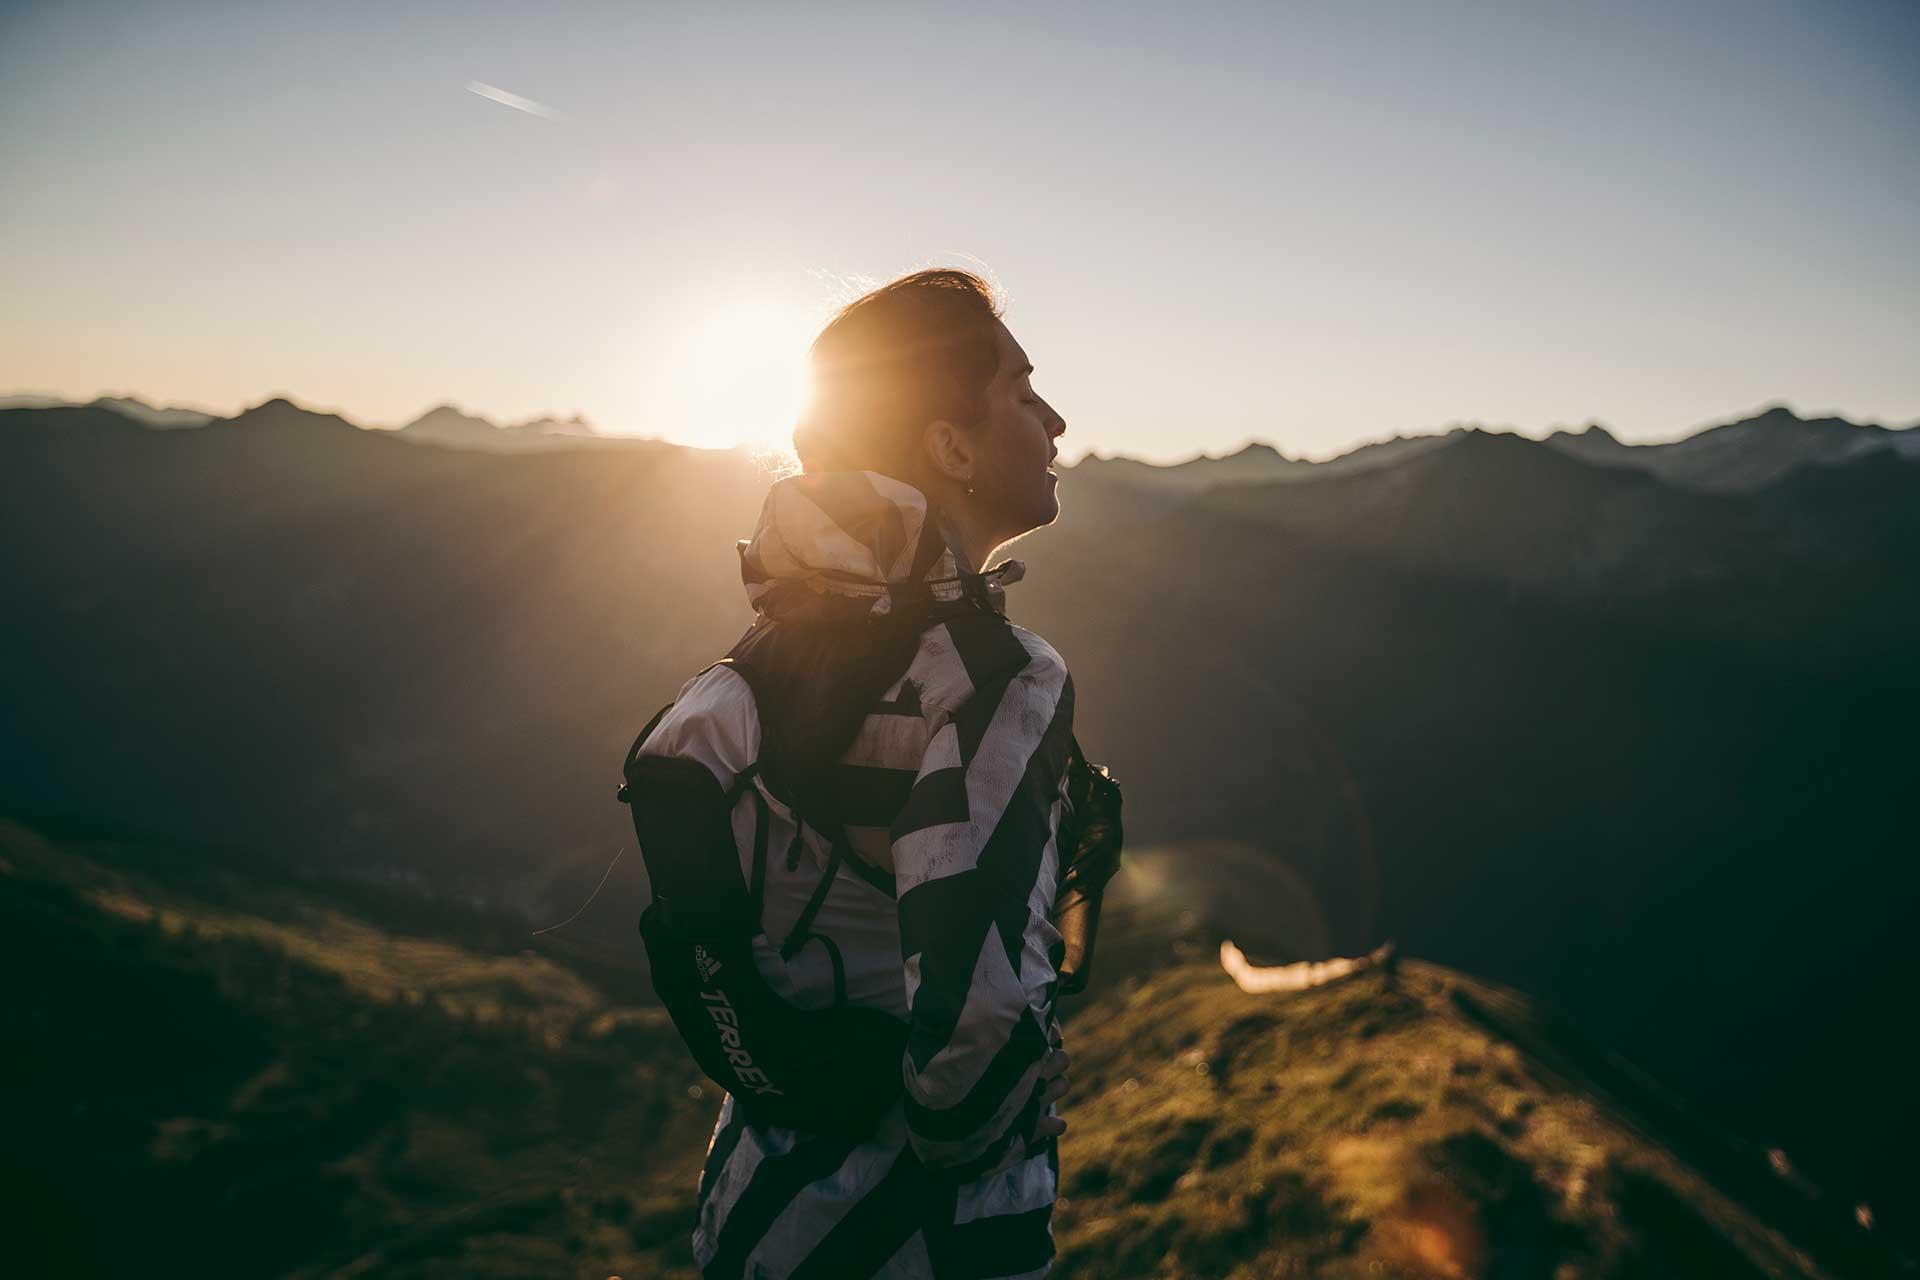 Berge Fotoproduktion Trailrunning Sport Berge Outdoor Sonnenaufgang Frankfurt